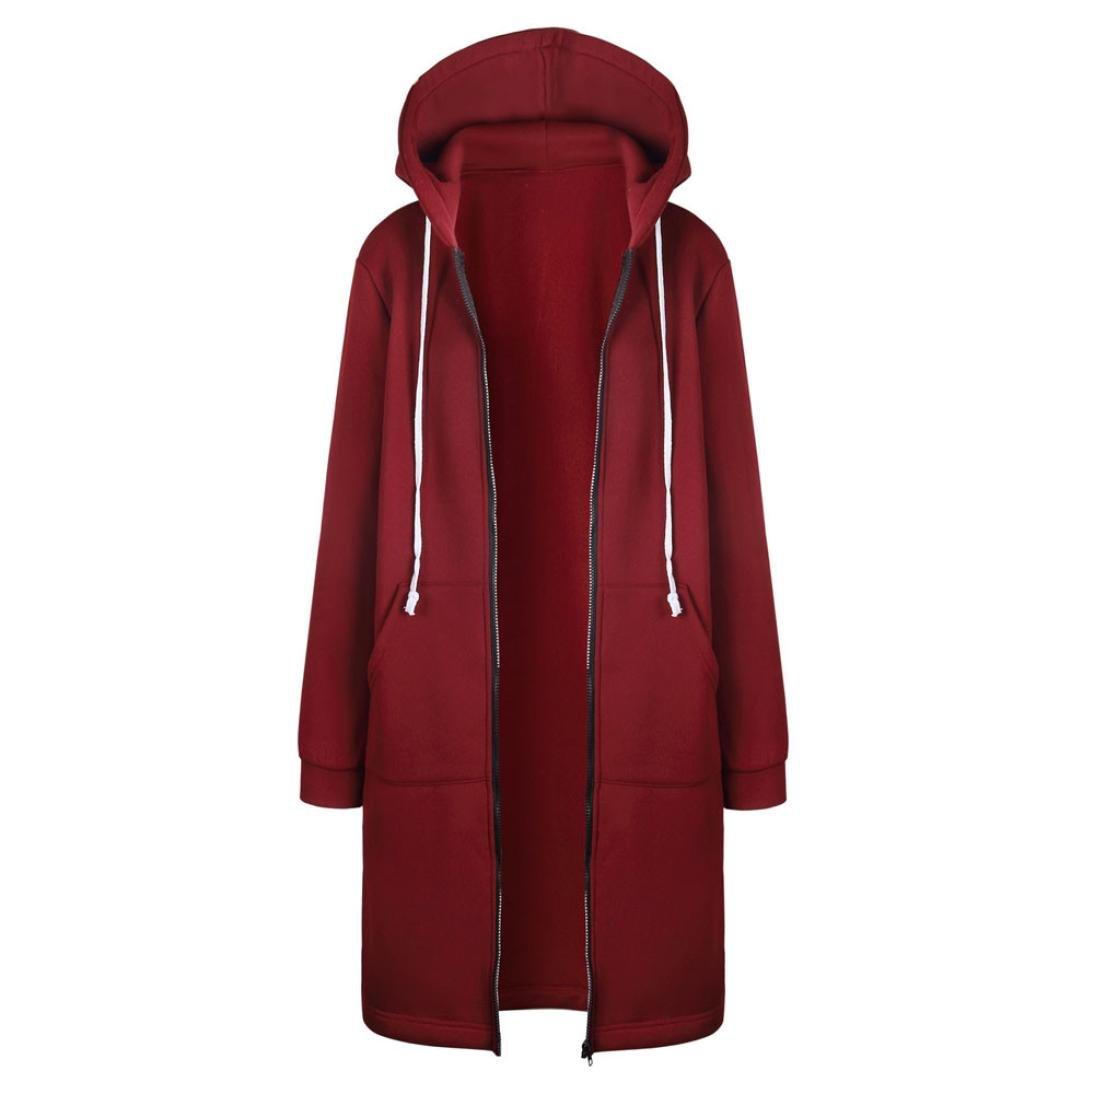 Long Sleeve Jacket,Gillberry Women's New Coat A-Lined Overcoat Hoodies Sweatshirt with Zipper (Red, S)